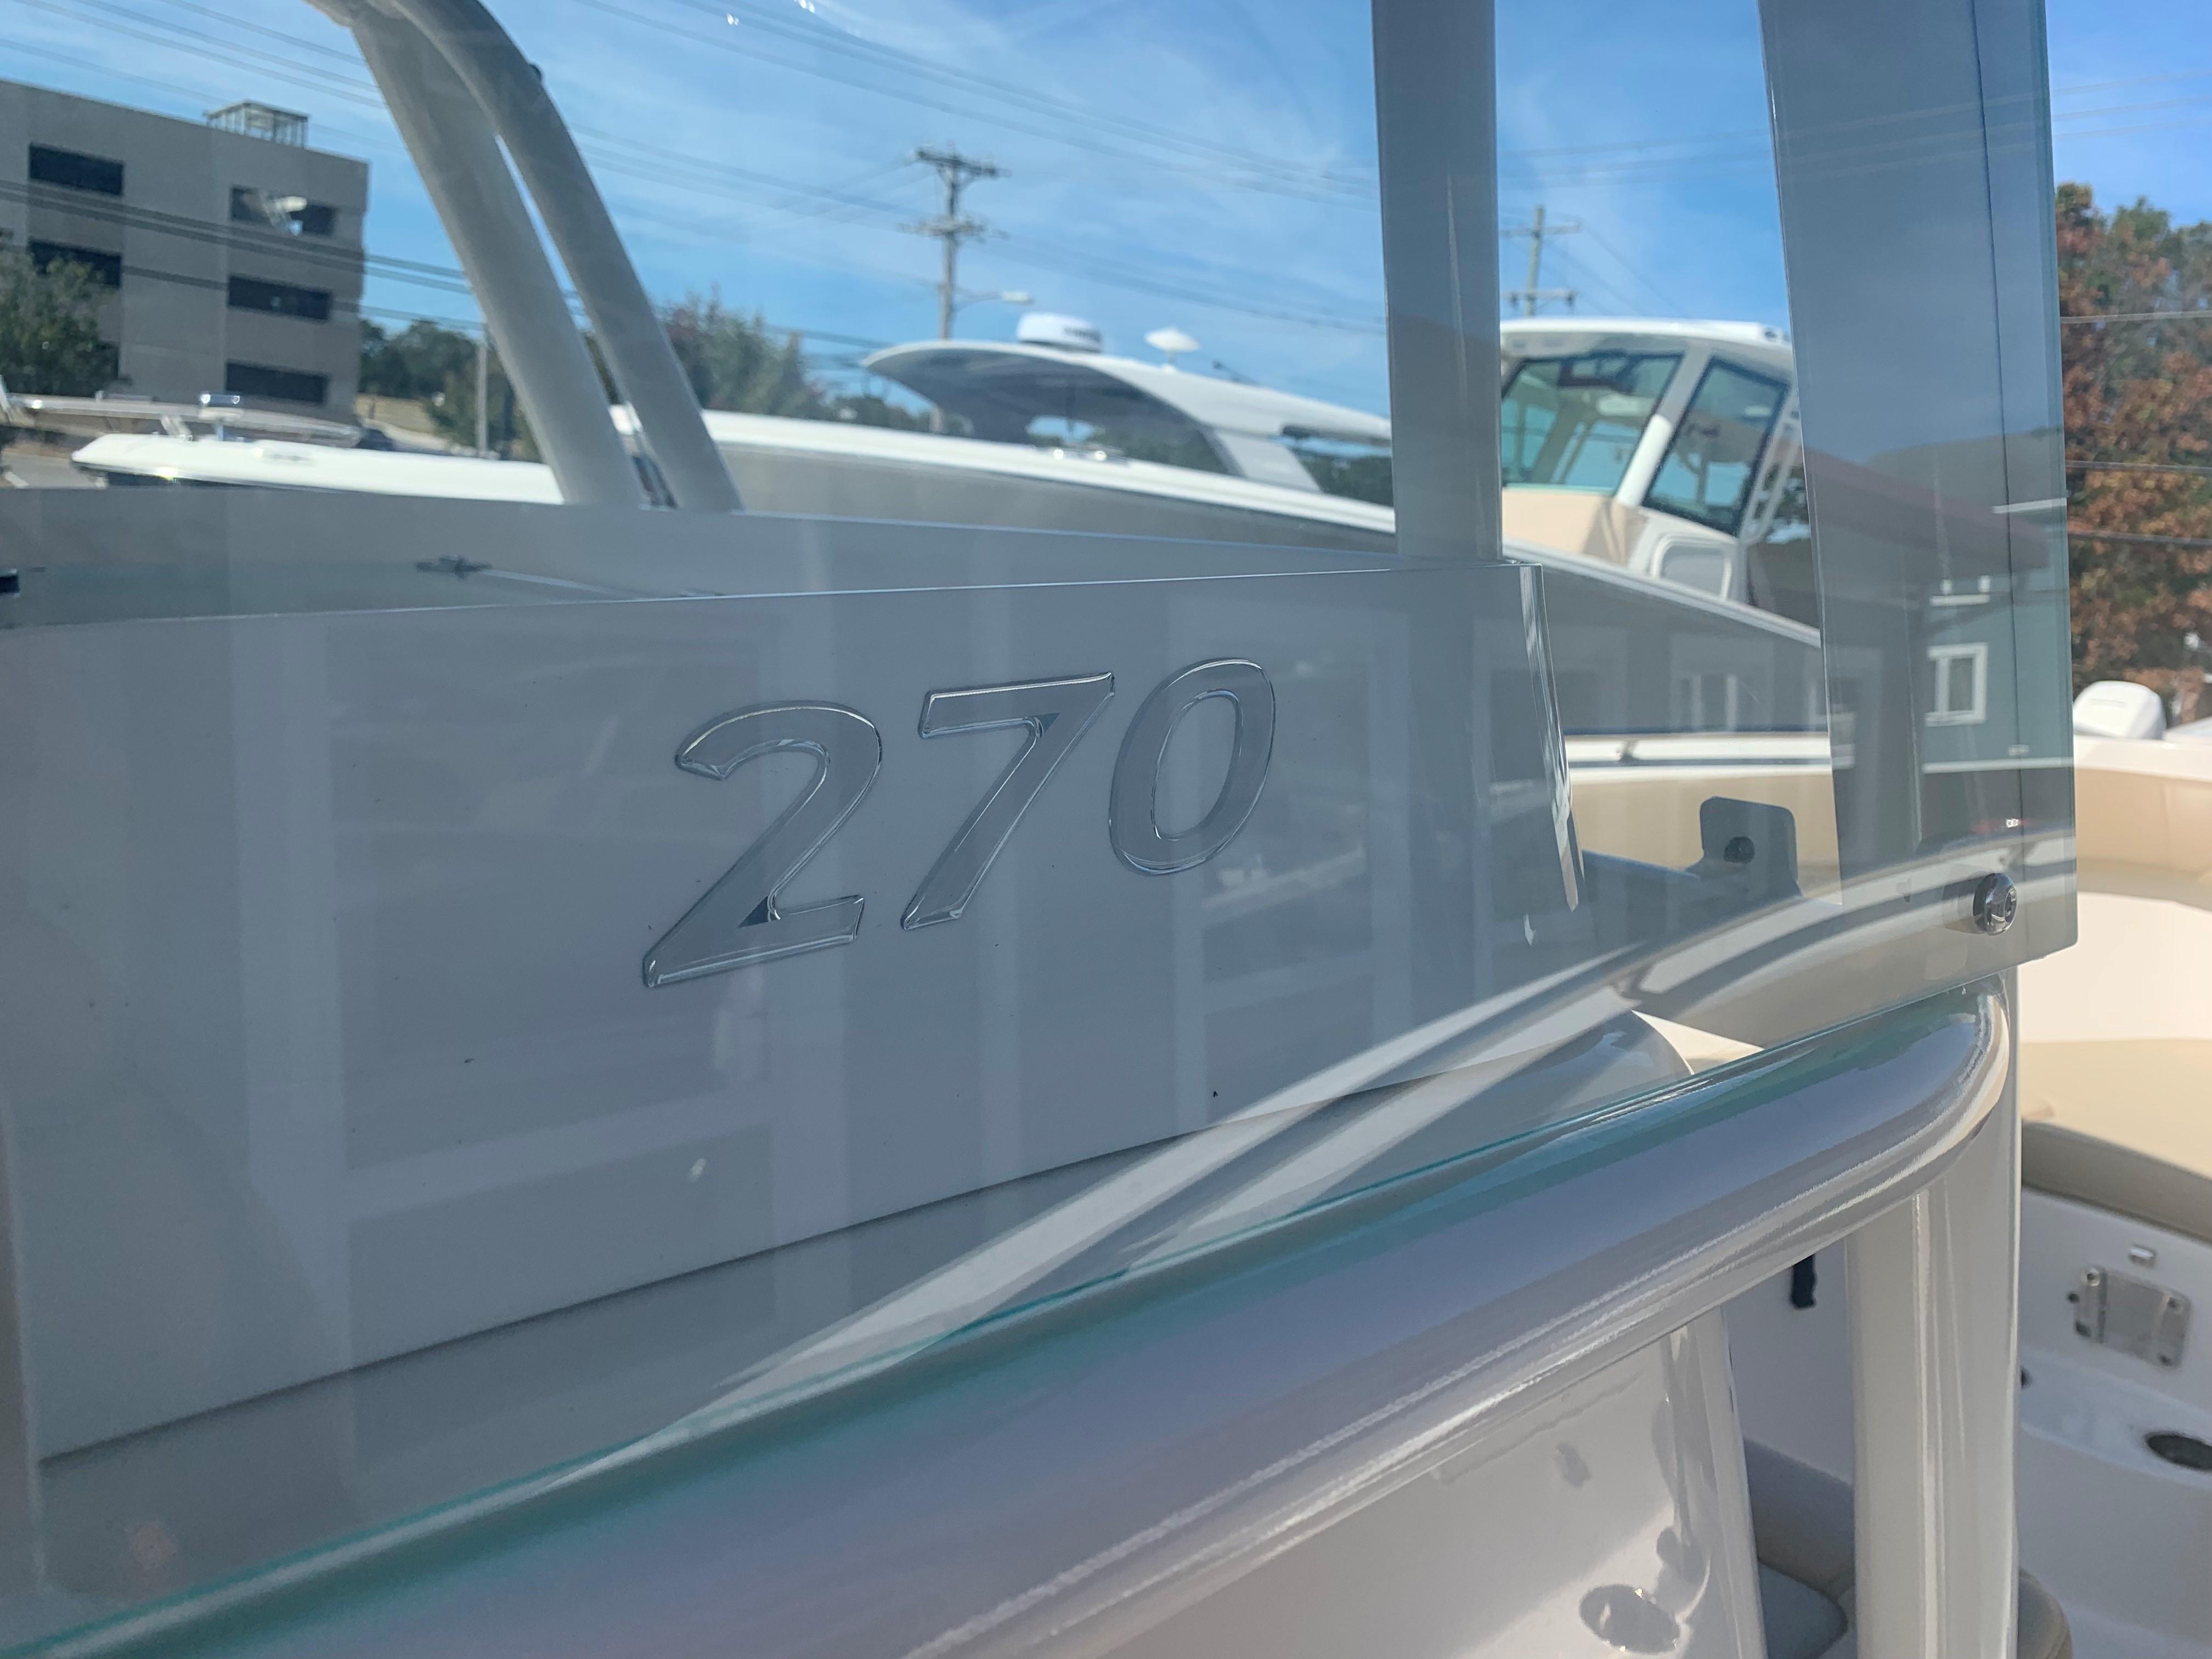 2020 Sailfish 270 CC Image Thumbnail #7